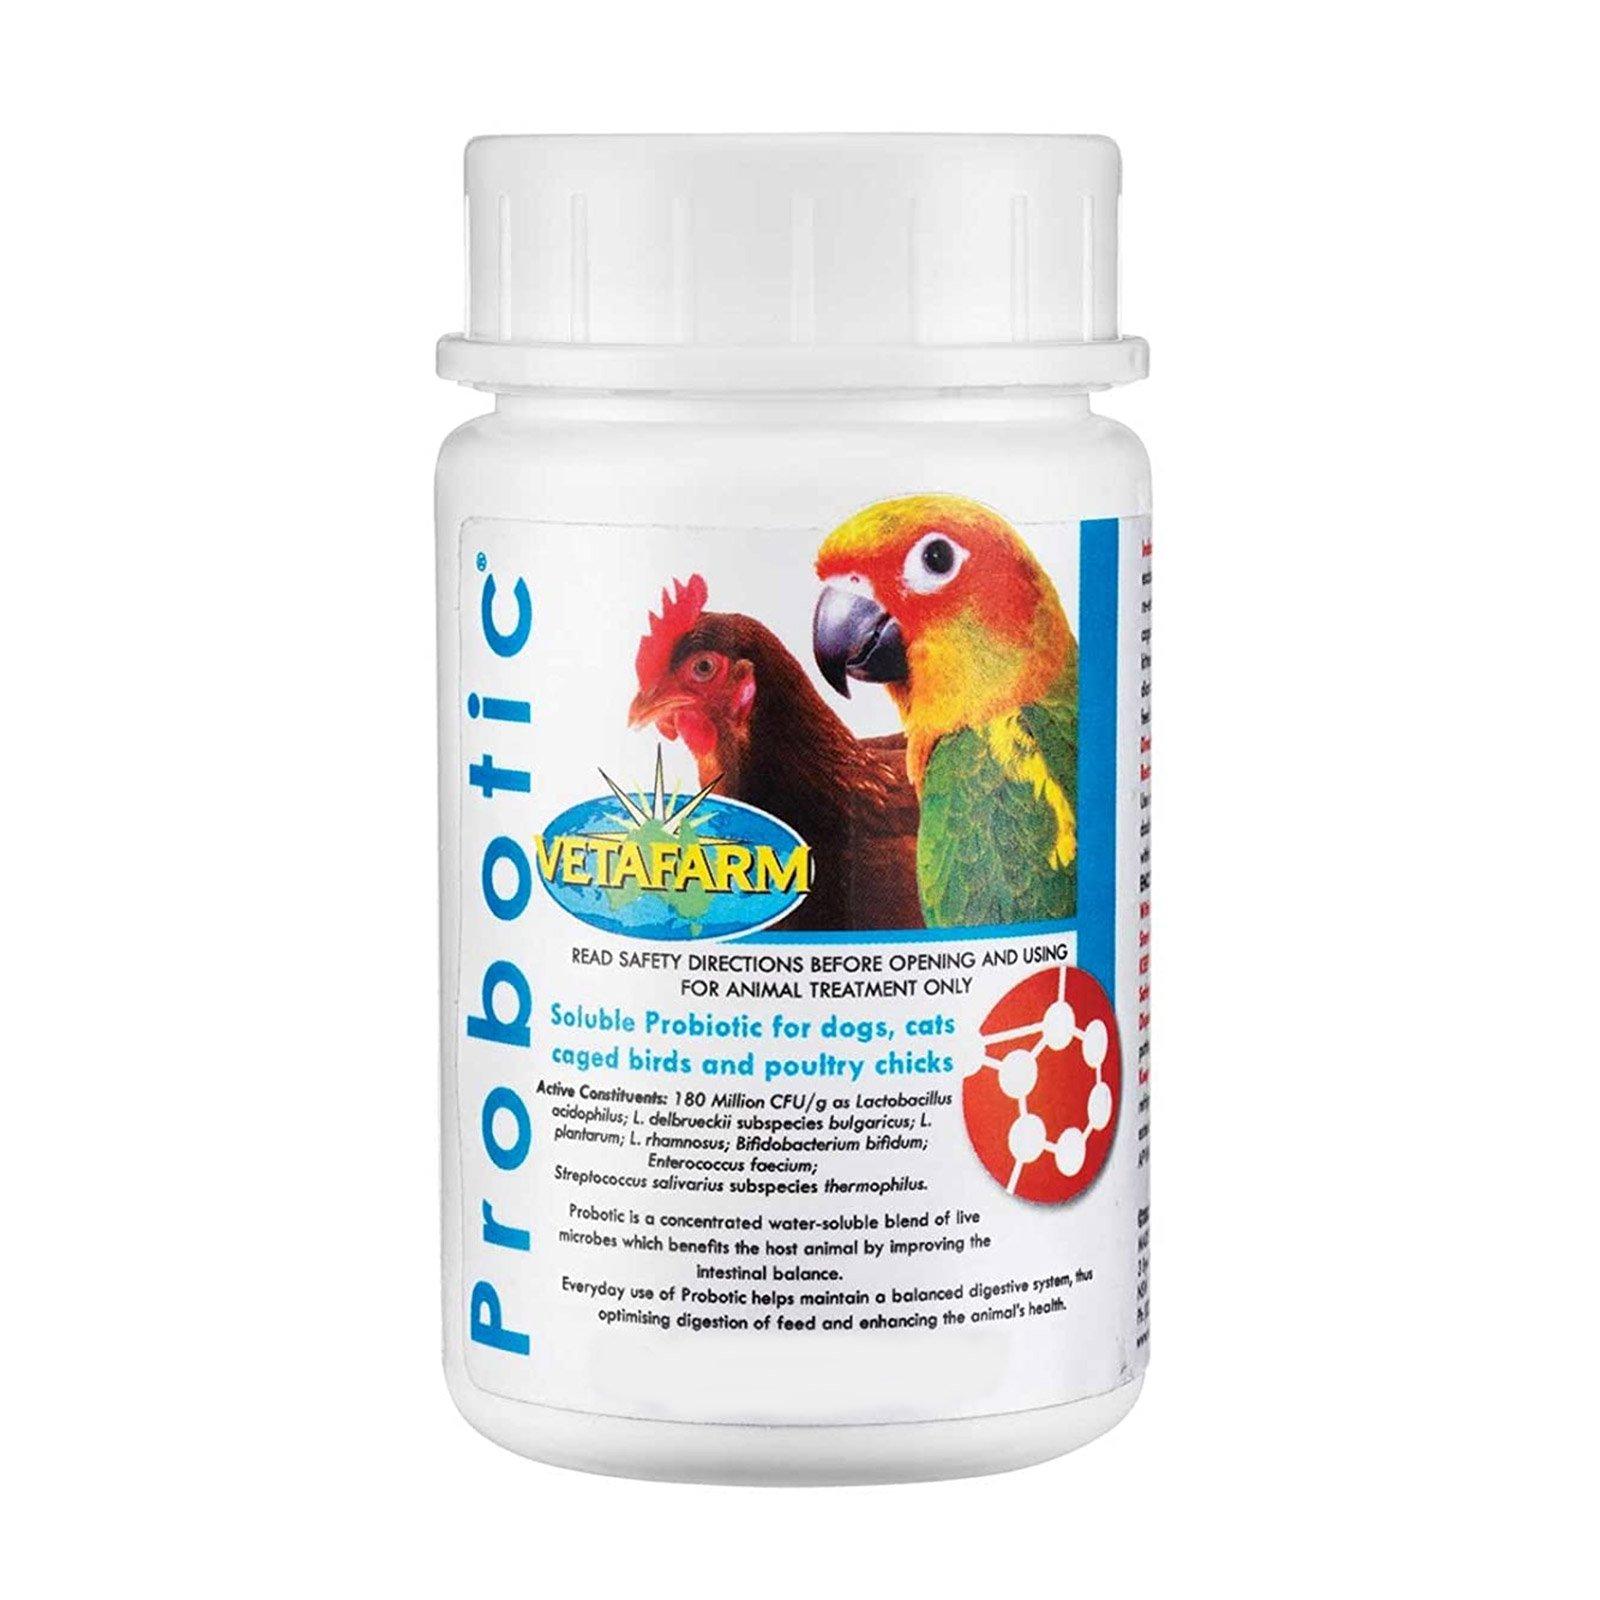 Vetafarm Probiotic for Pigeons/Caged Birds